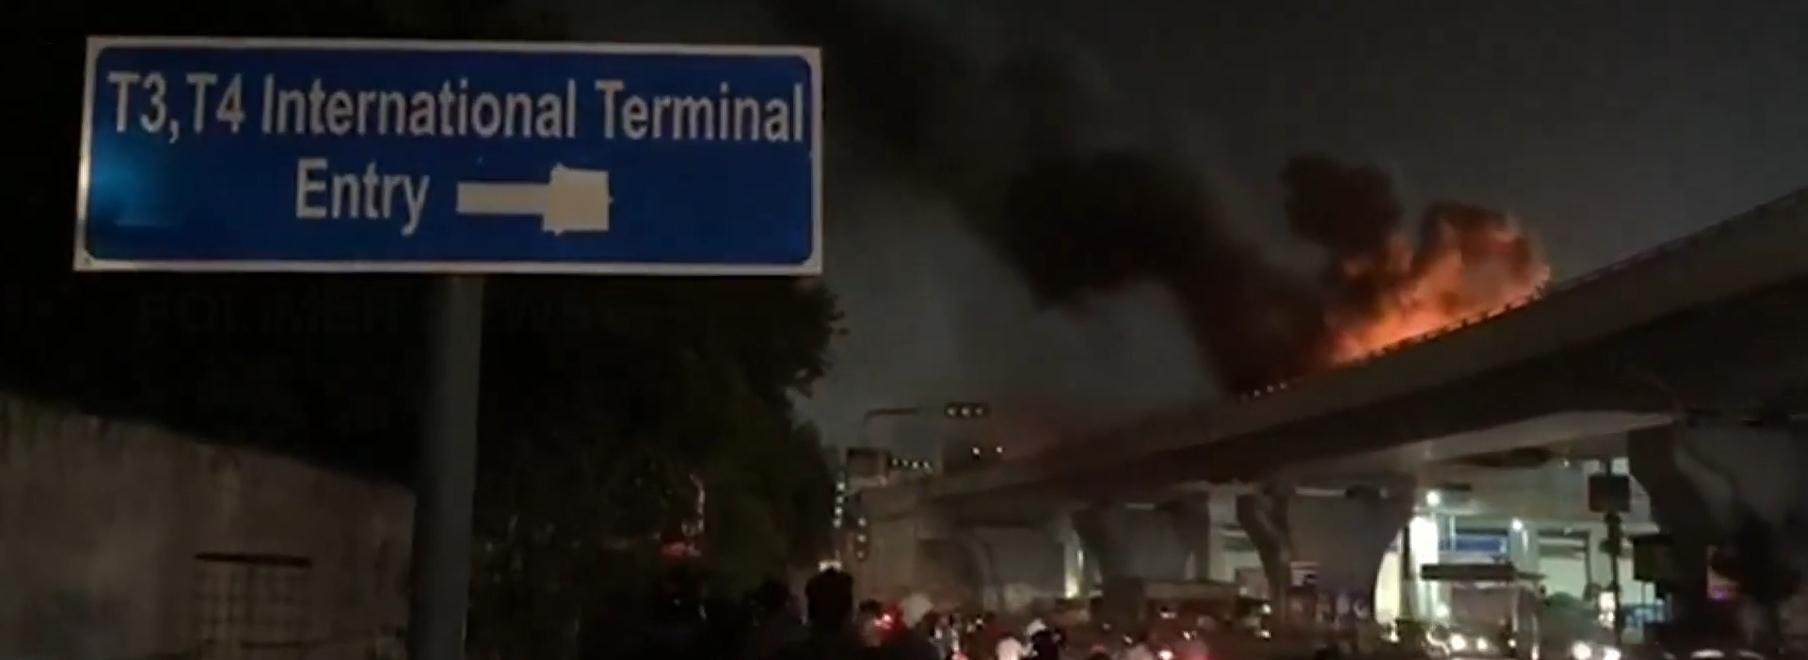 Chennai international airport flyover car fire. Photo credit : Polimer